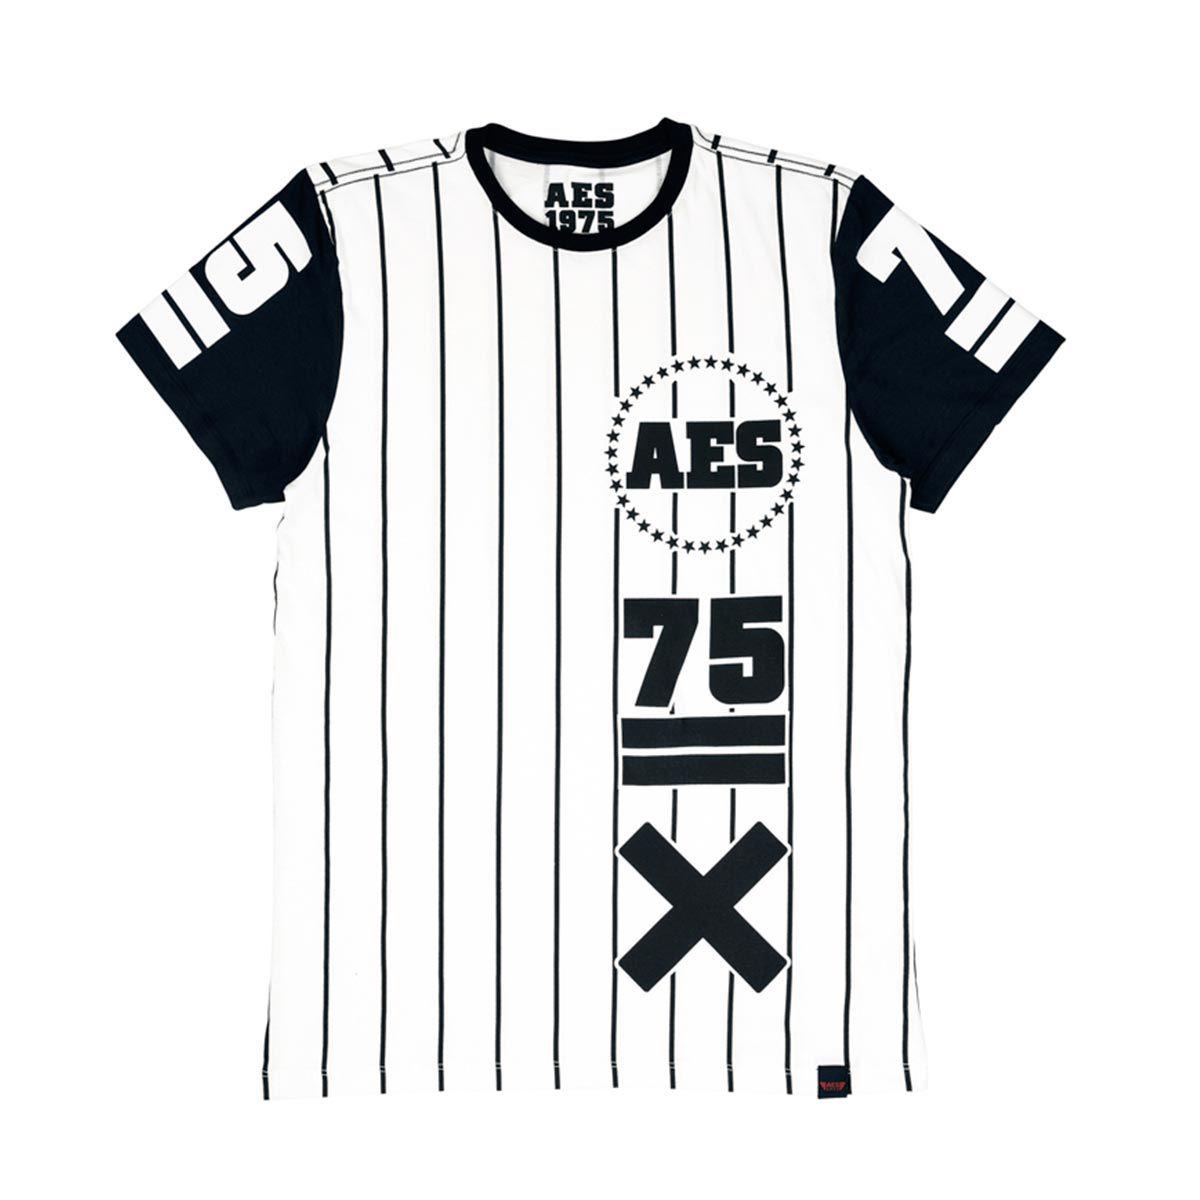 Camiseta AES 1975 Alongada (swag) ll